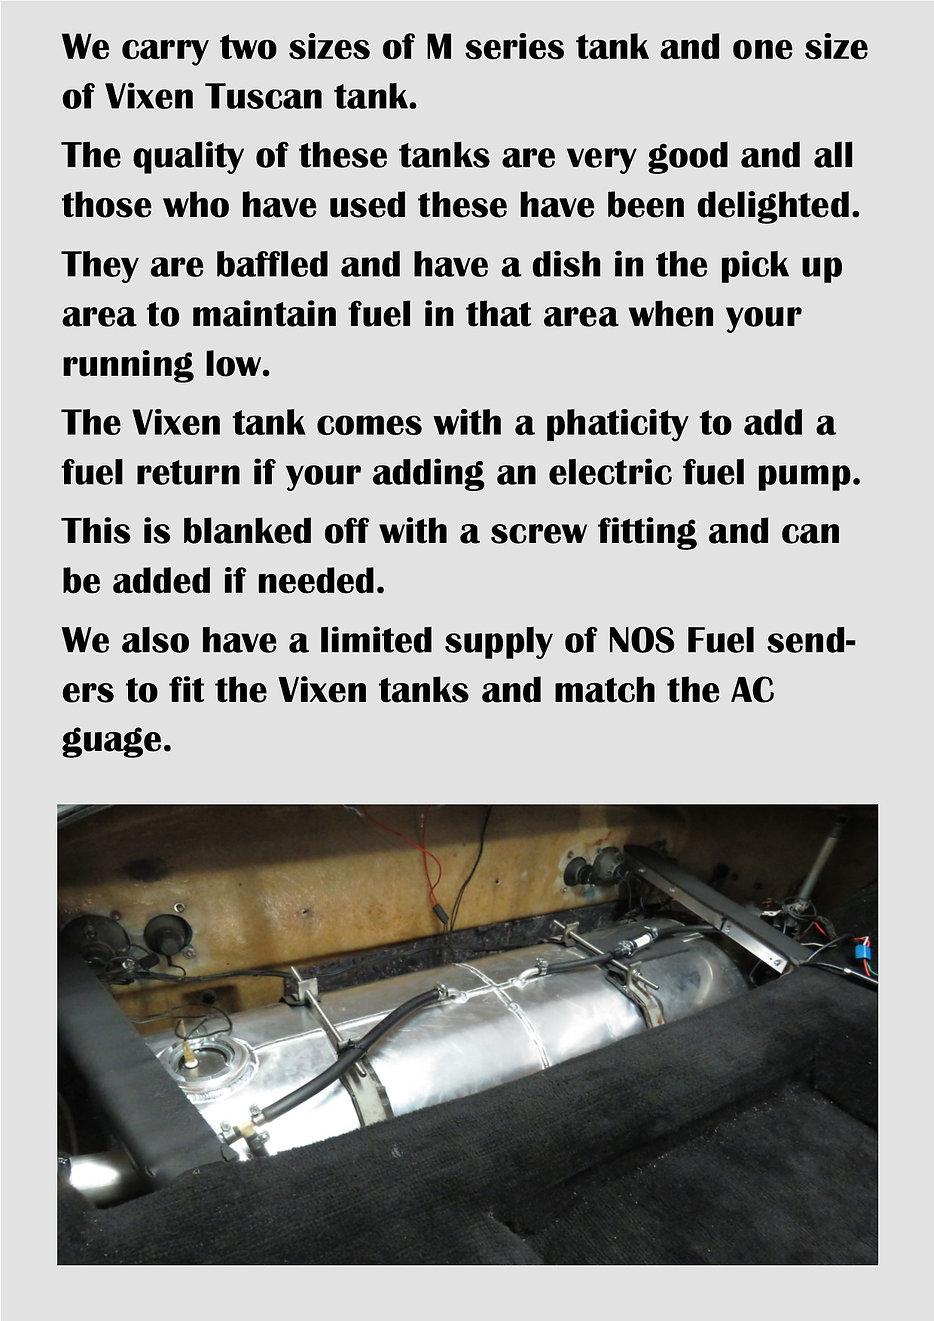 Fuel Tank webb site 2.jpg